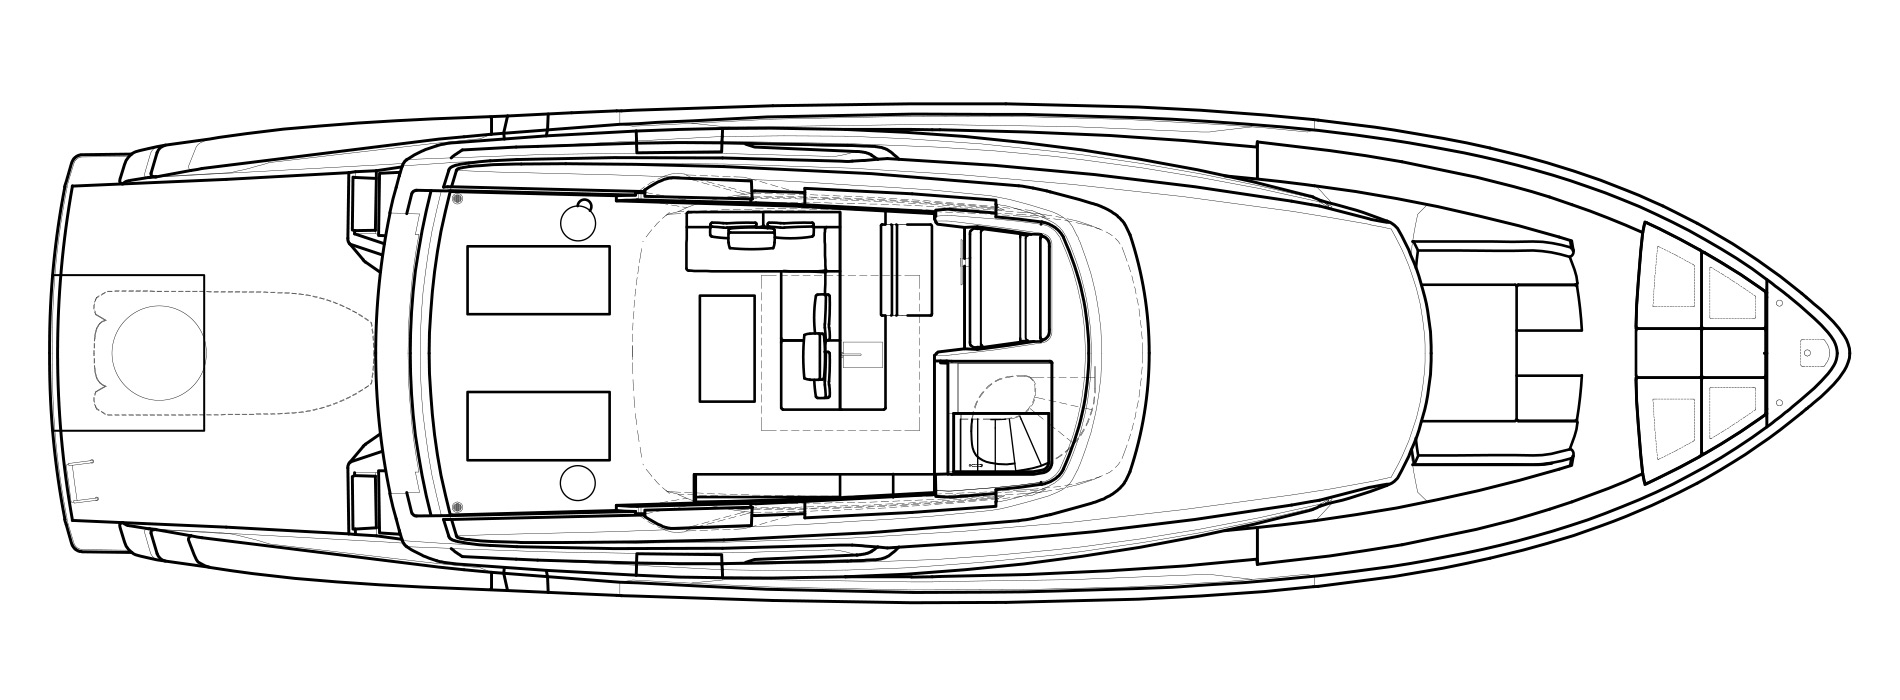 Sanlorenzo Yachts SX76 Flying bridge Versione Lissoni